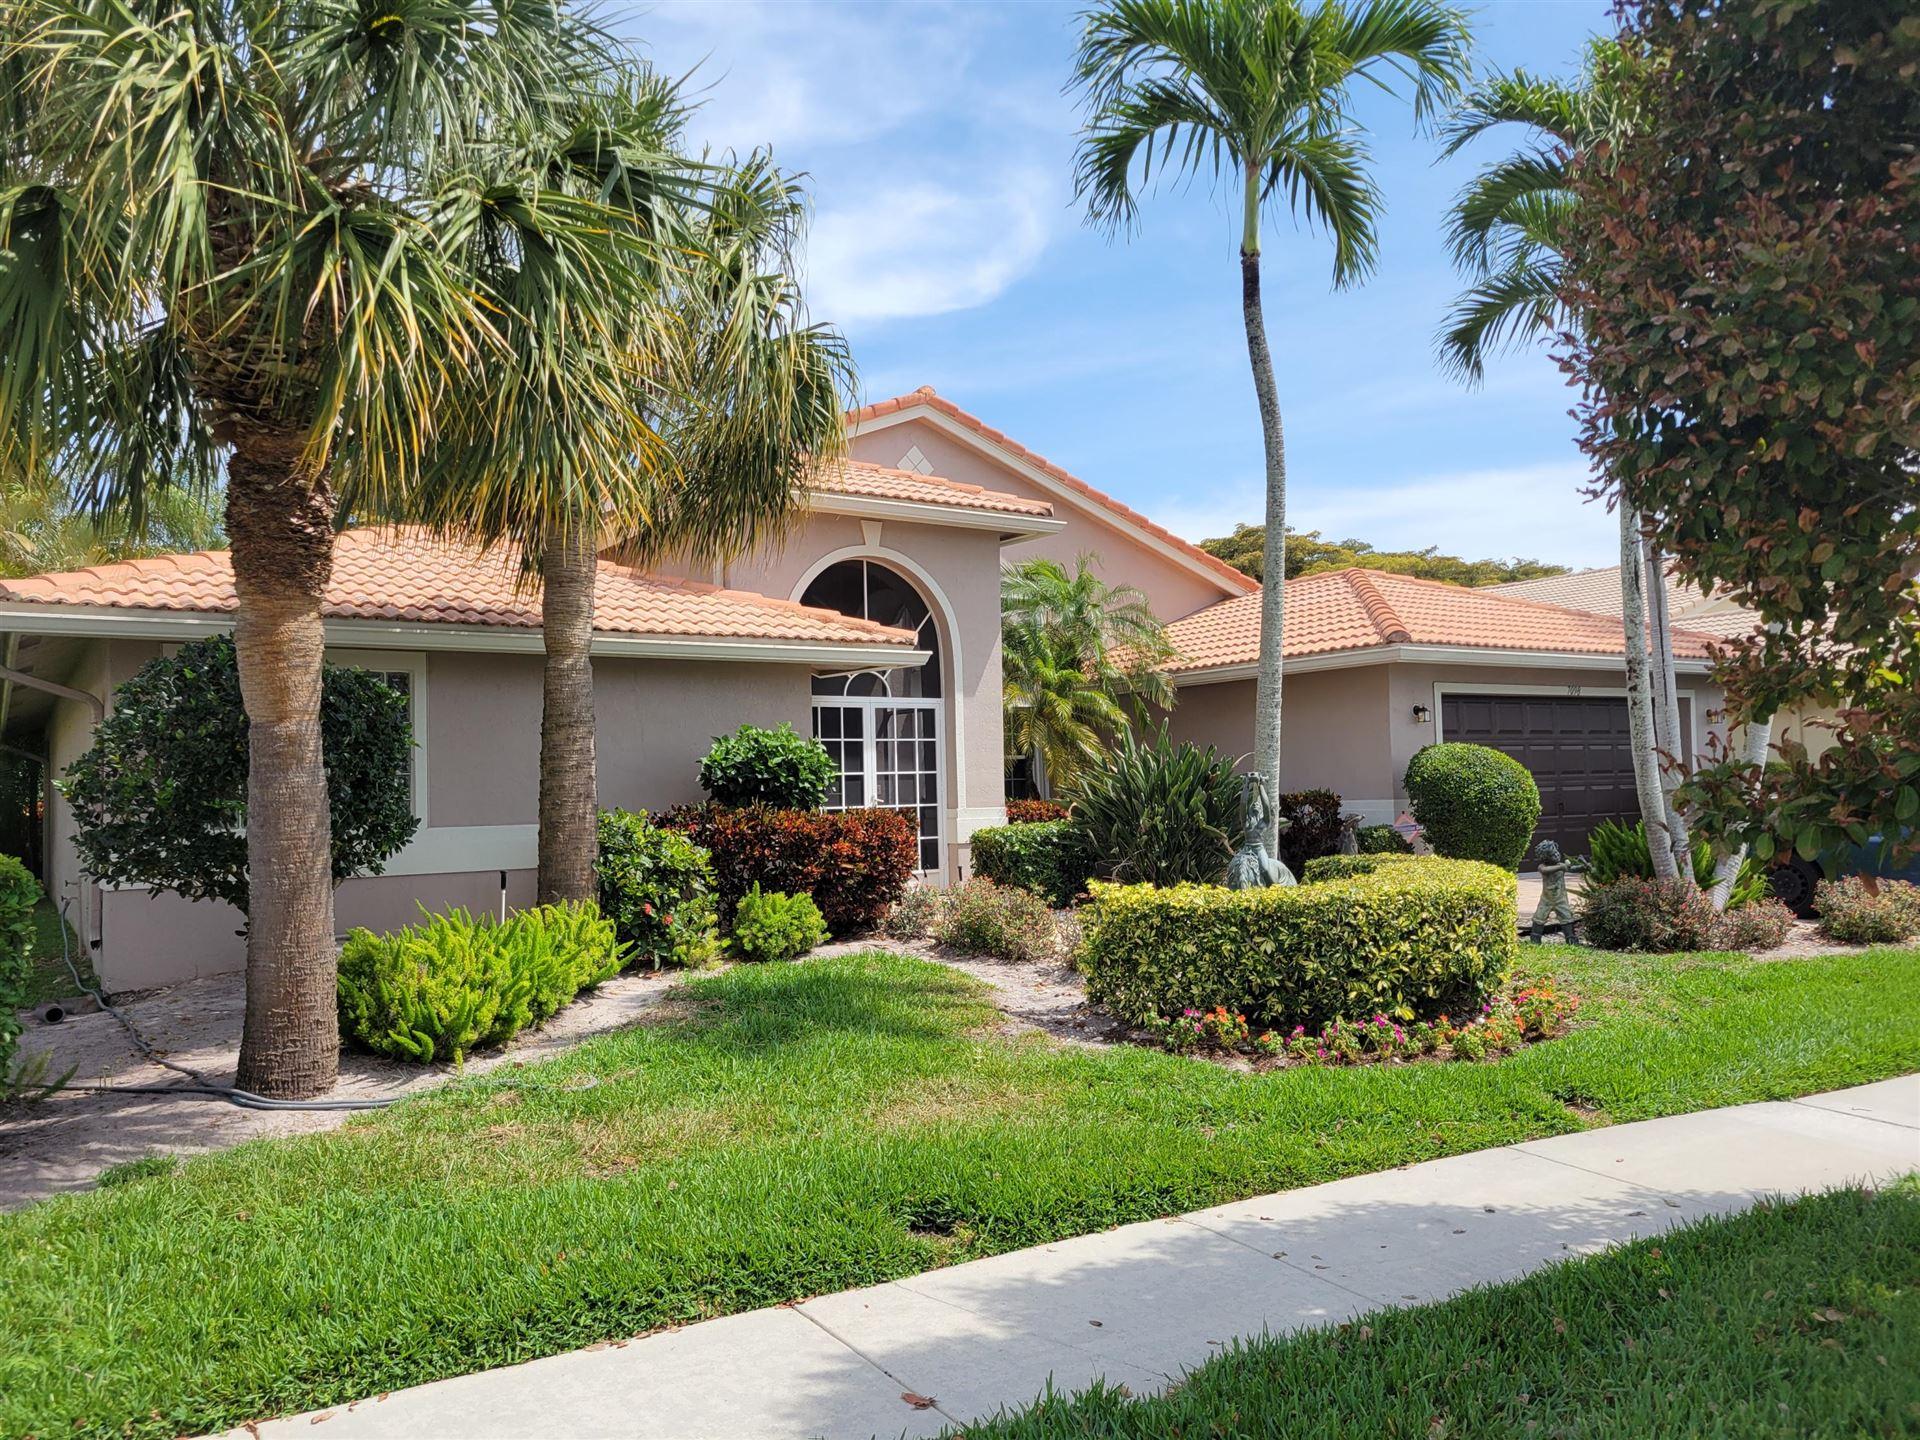 7098 Falls Road E, Boynton Beach, FL 33437 - #: RX-10703944